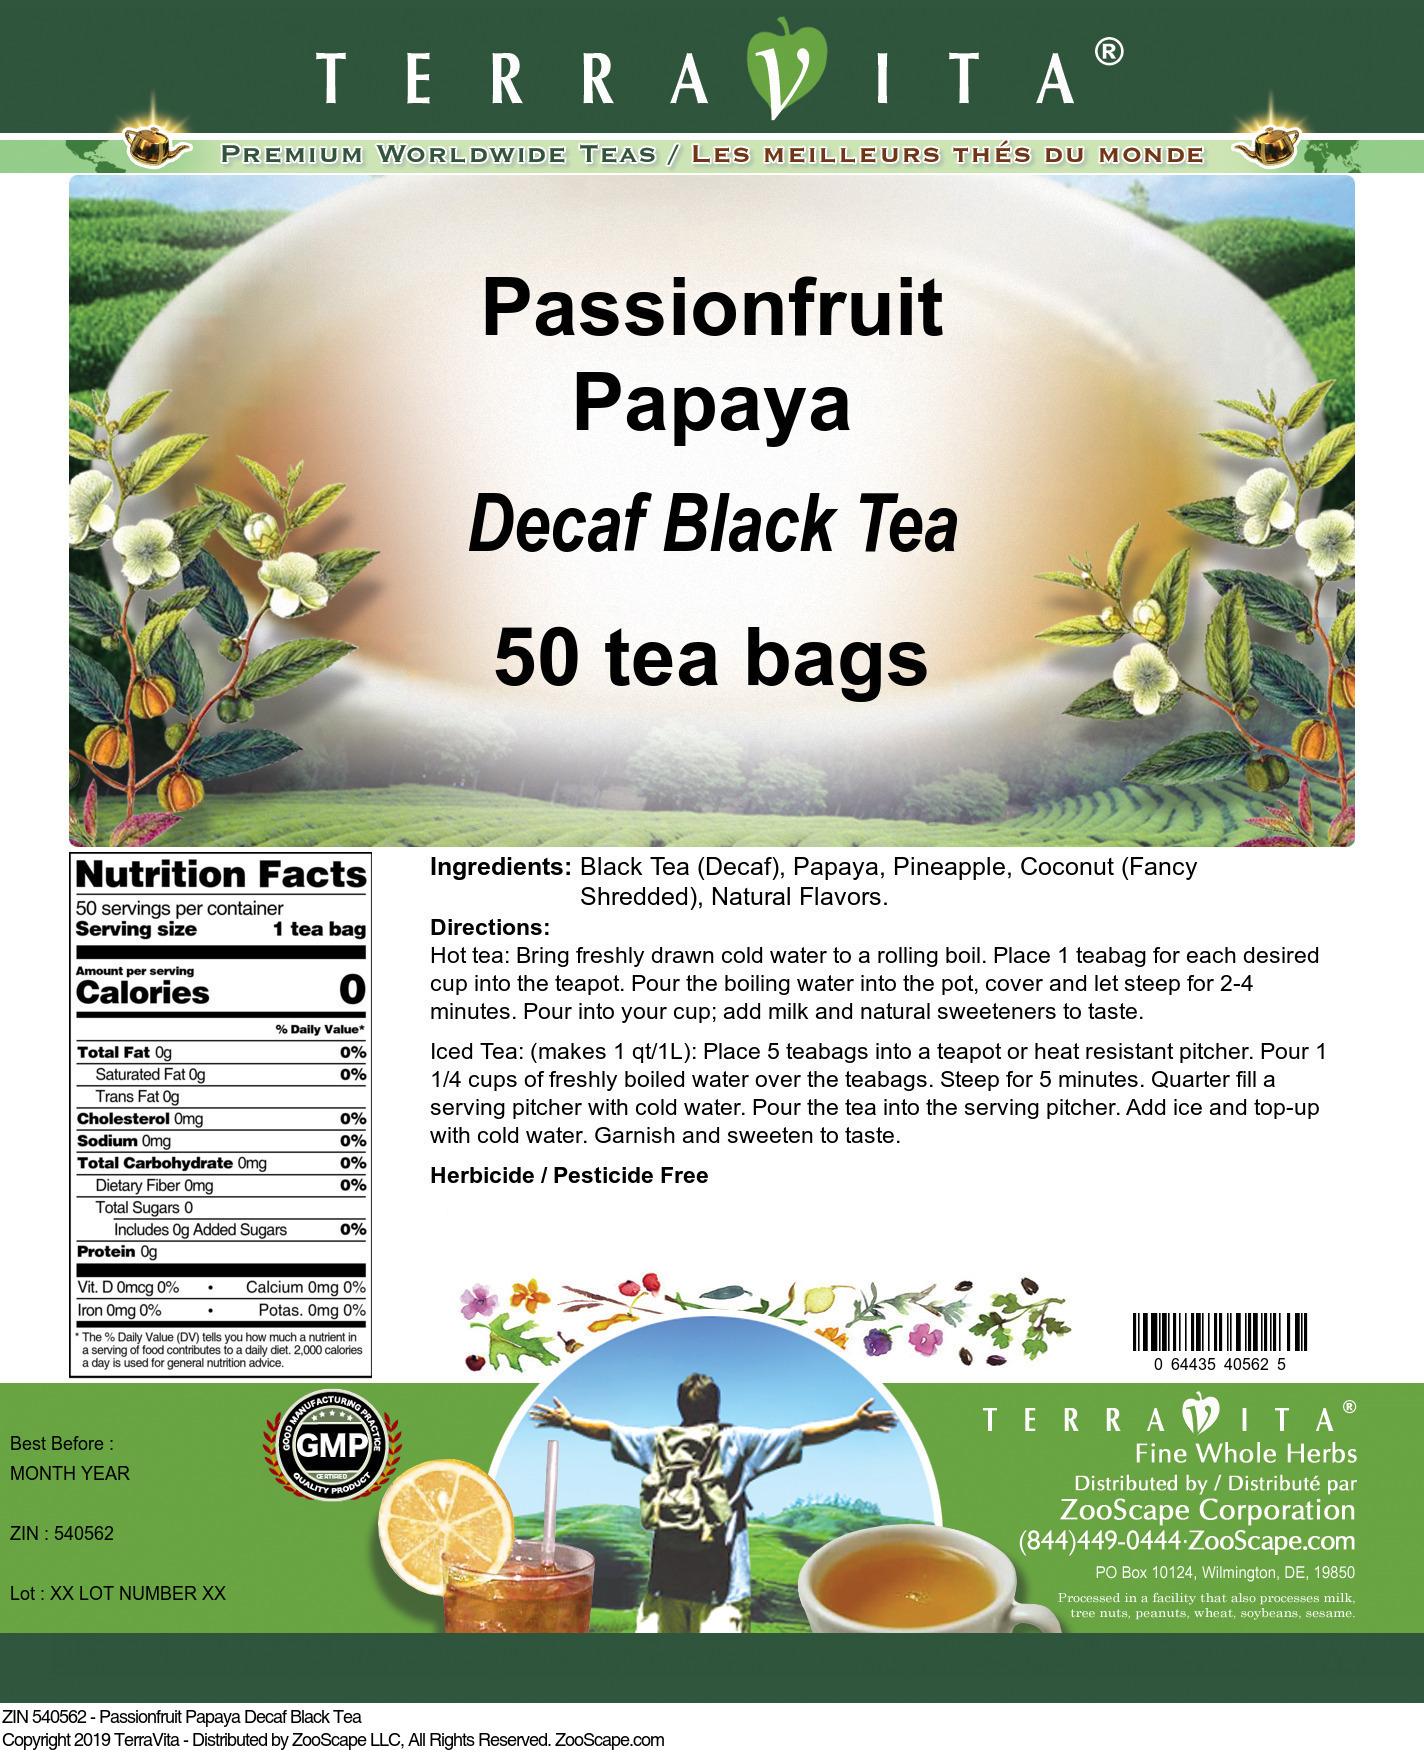 Passionfruit Papaya Decaf Black Tea